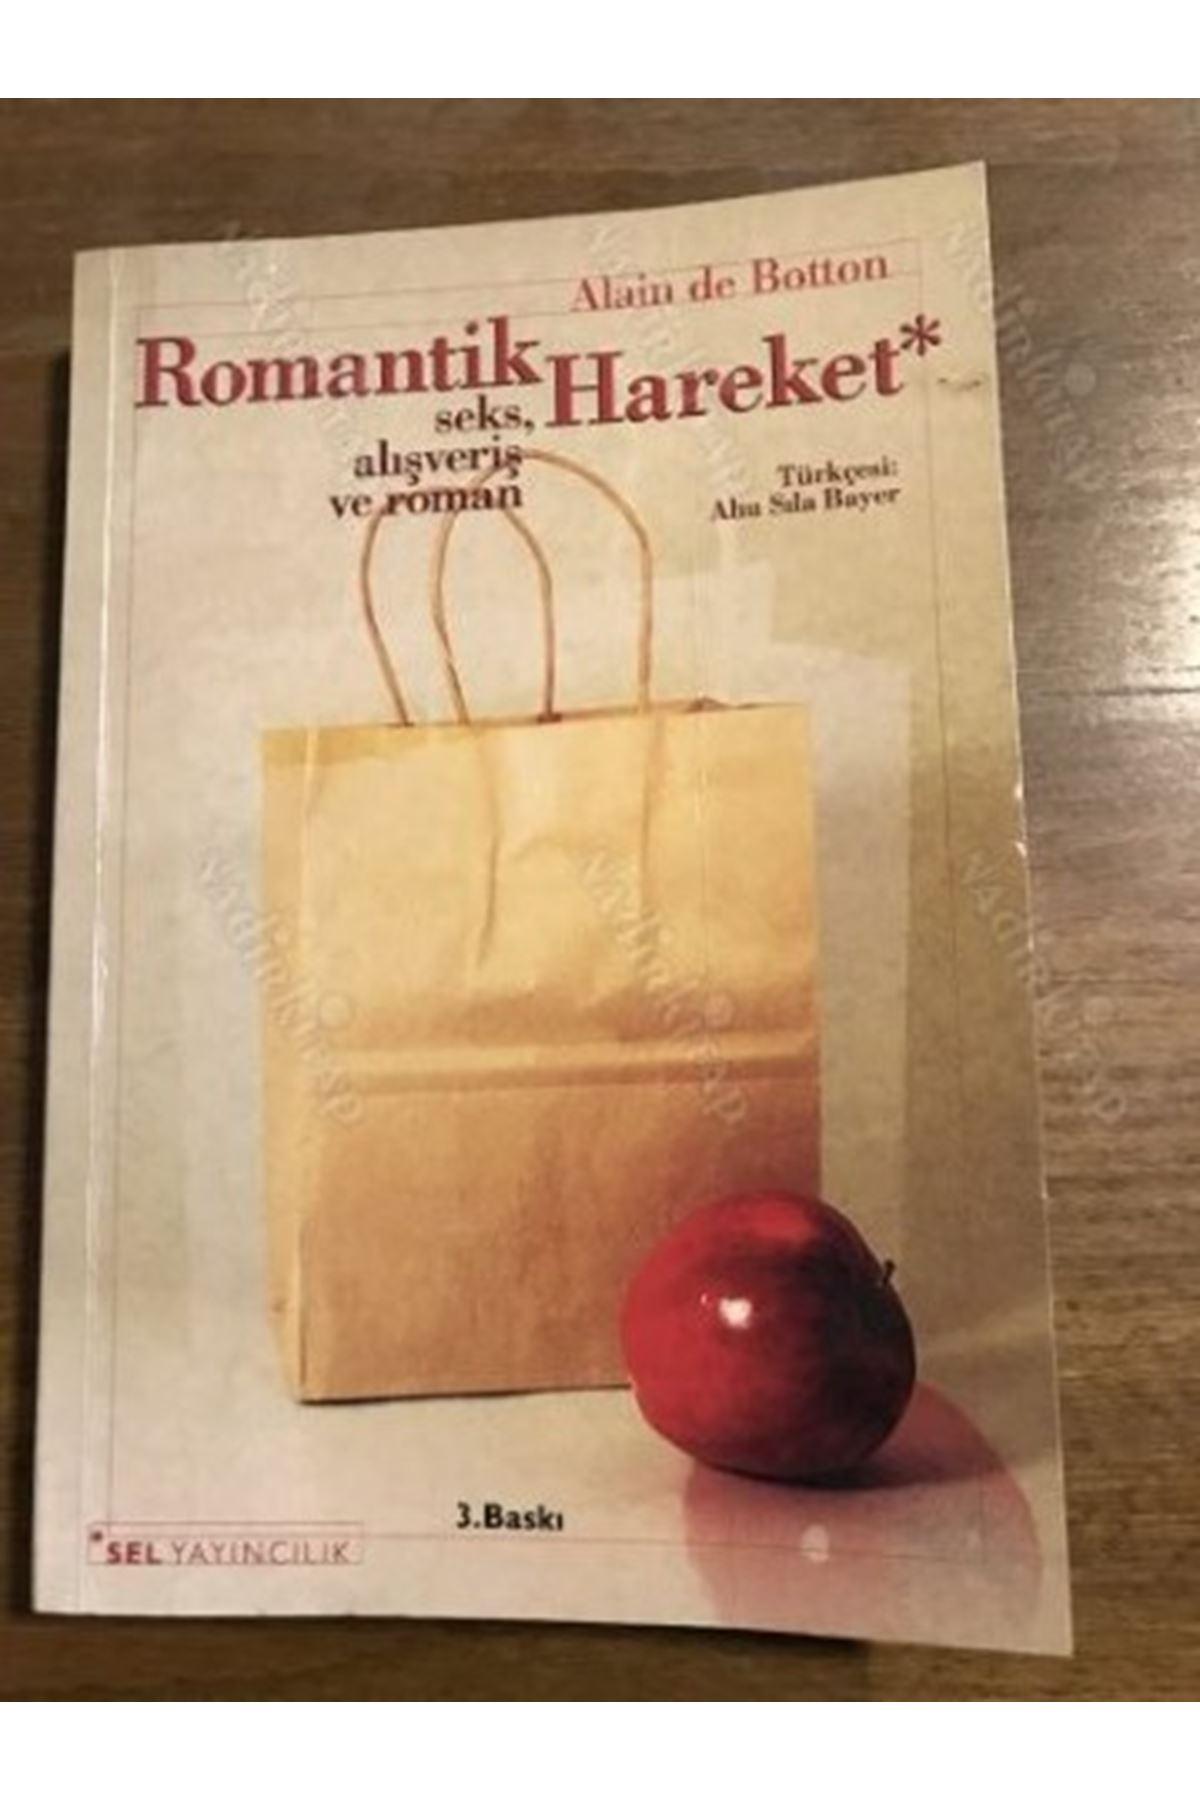 ALAİN DE BOTTON  - ROMANTİK HAREKET